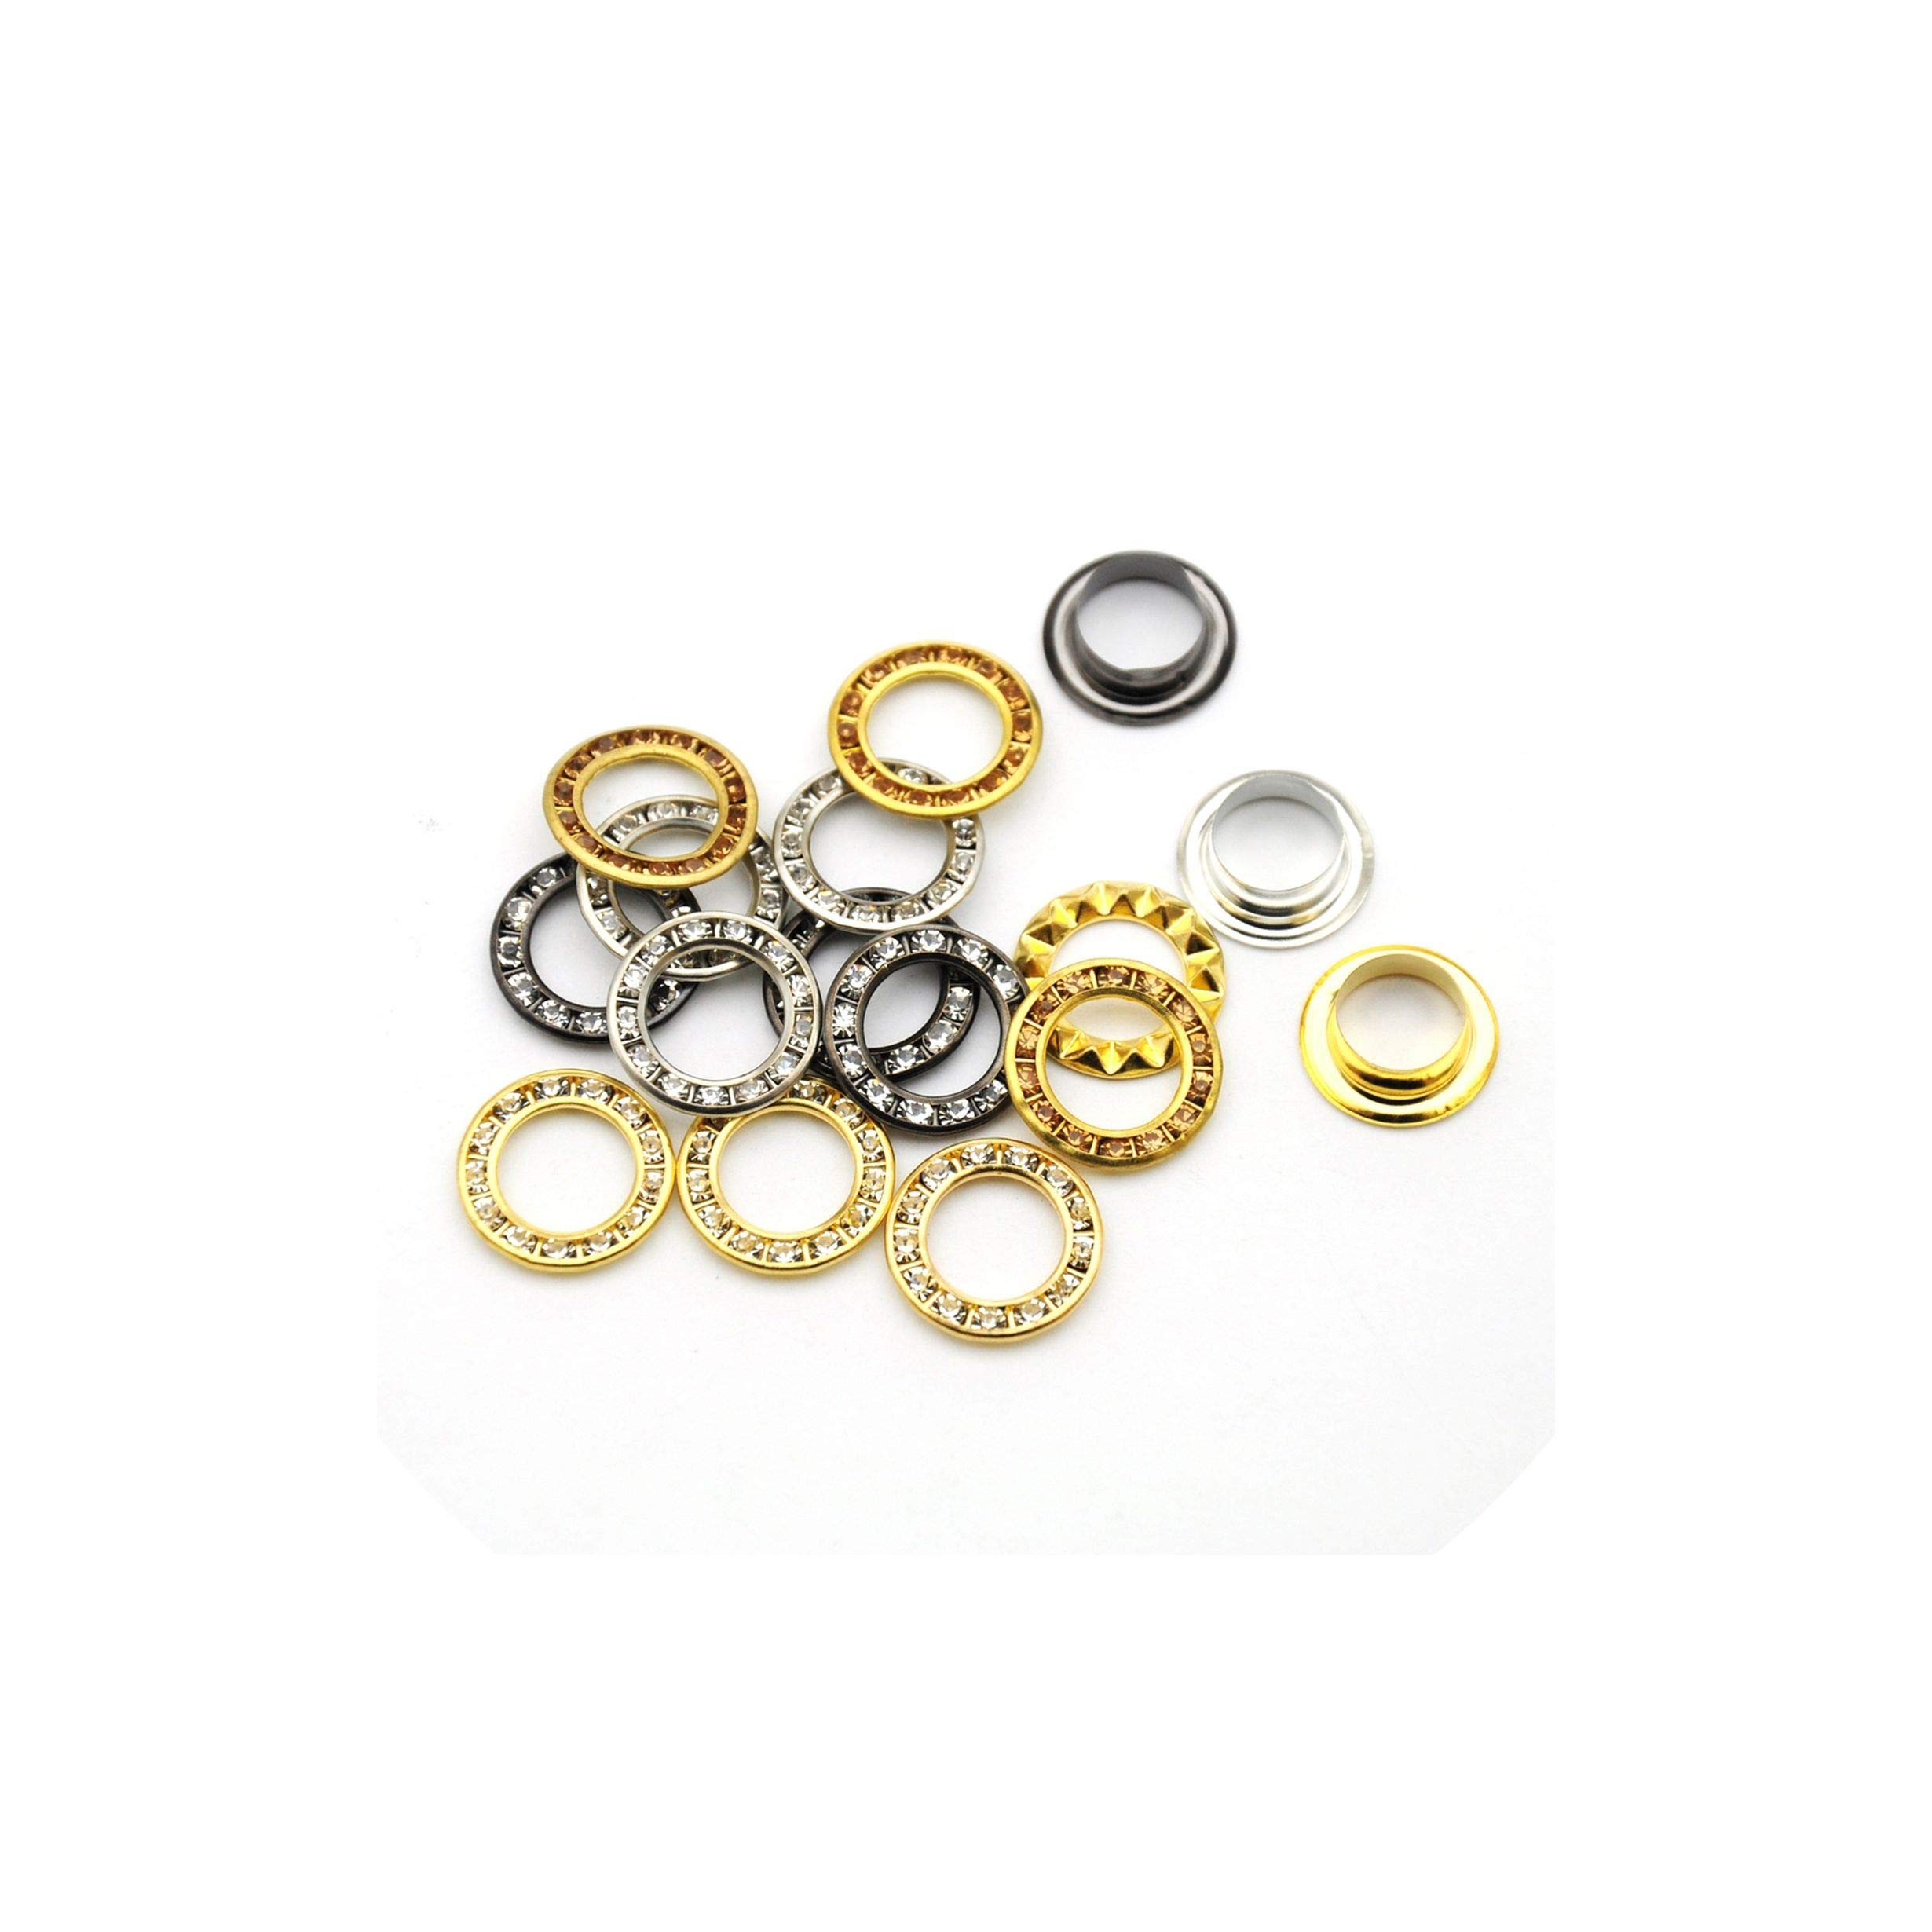 100Sets 15Mm Round Metal Brass Rhinestone Eyelets Crystal Grommets Shoe Christmas Decoration,1250Sets